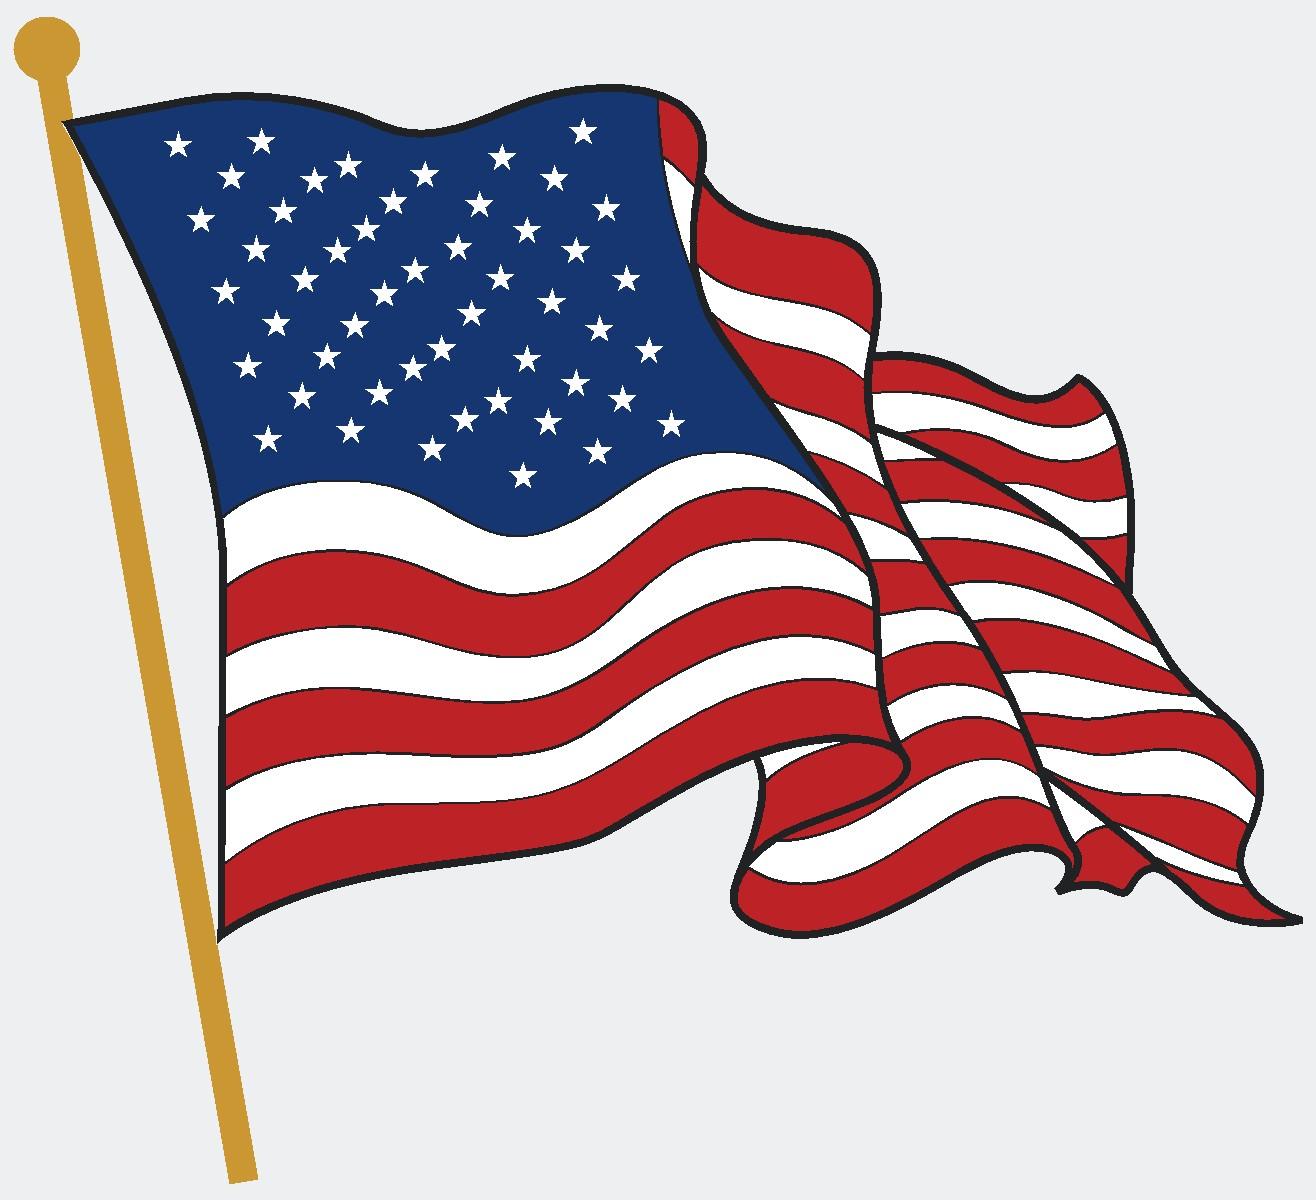 American Flags Clipart - American Flag Clipart